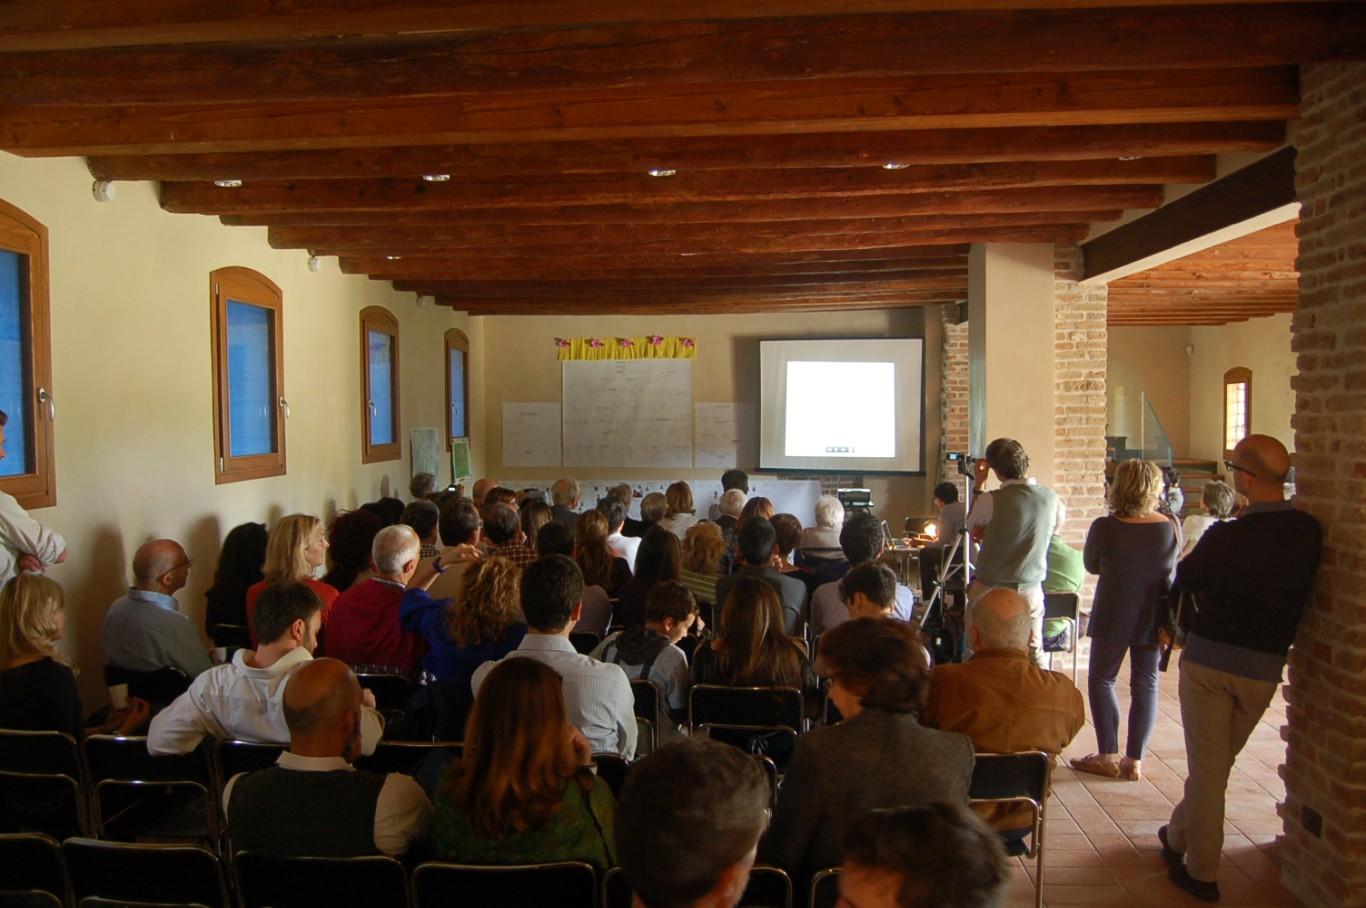 Sale Conferenze Padova1